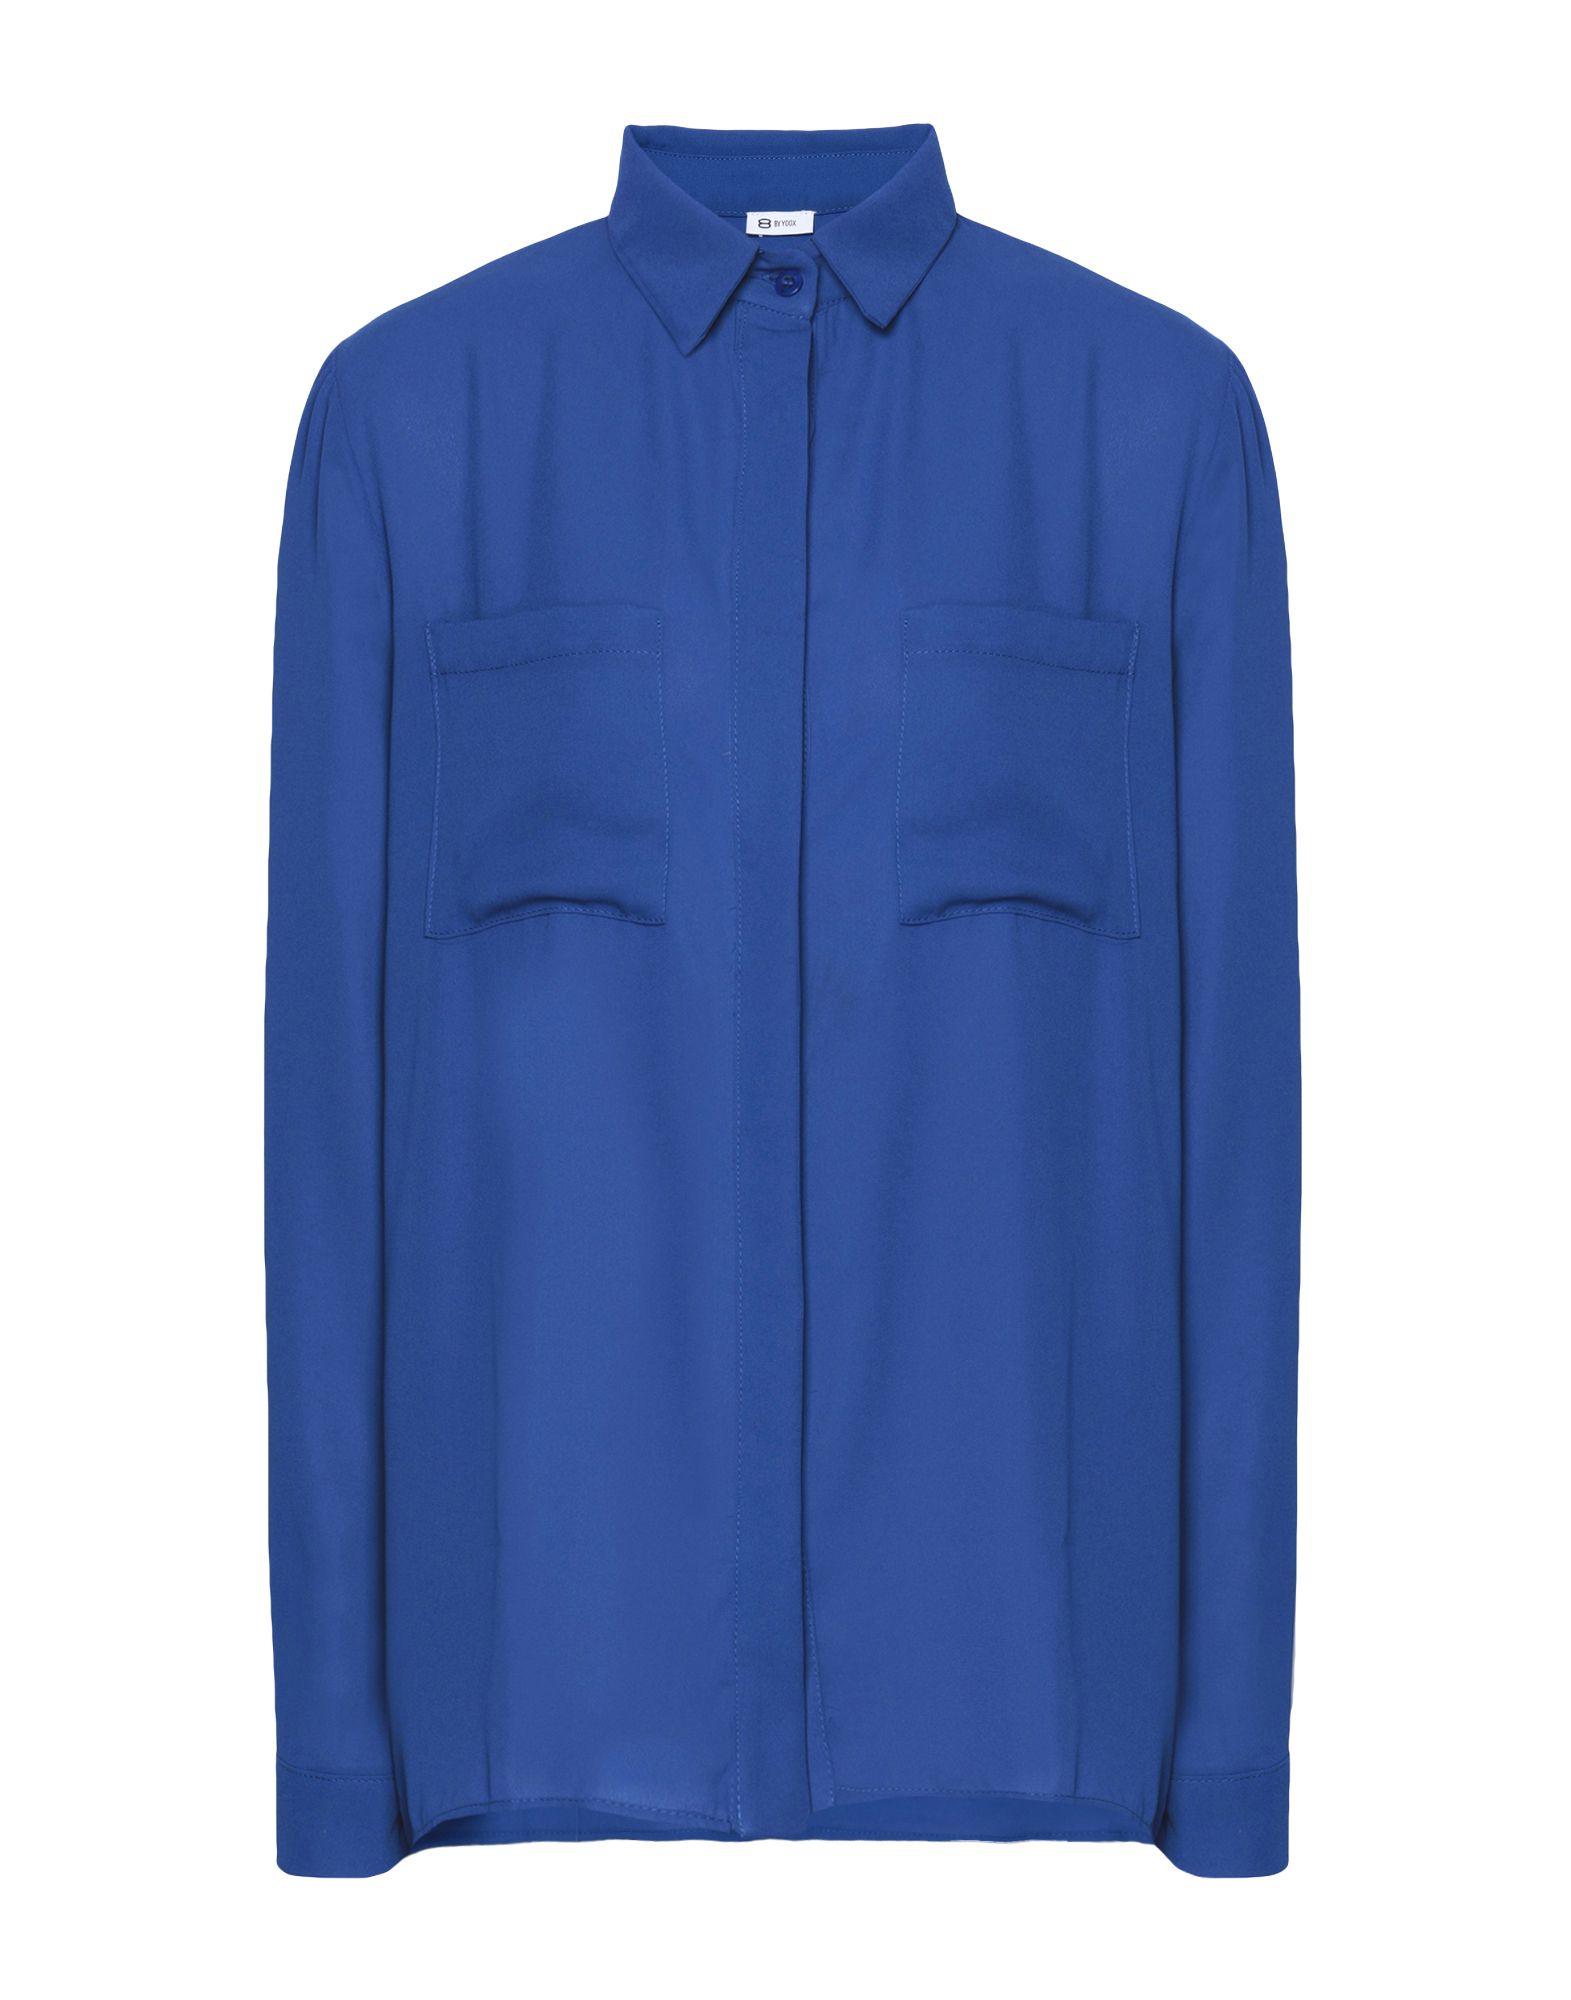 8 by YOOX Pубашка блузки и рубашки frizzzy рубашка детская калейдоскоп пуговиц